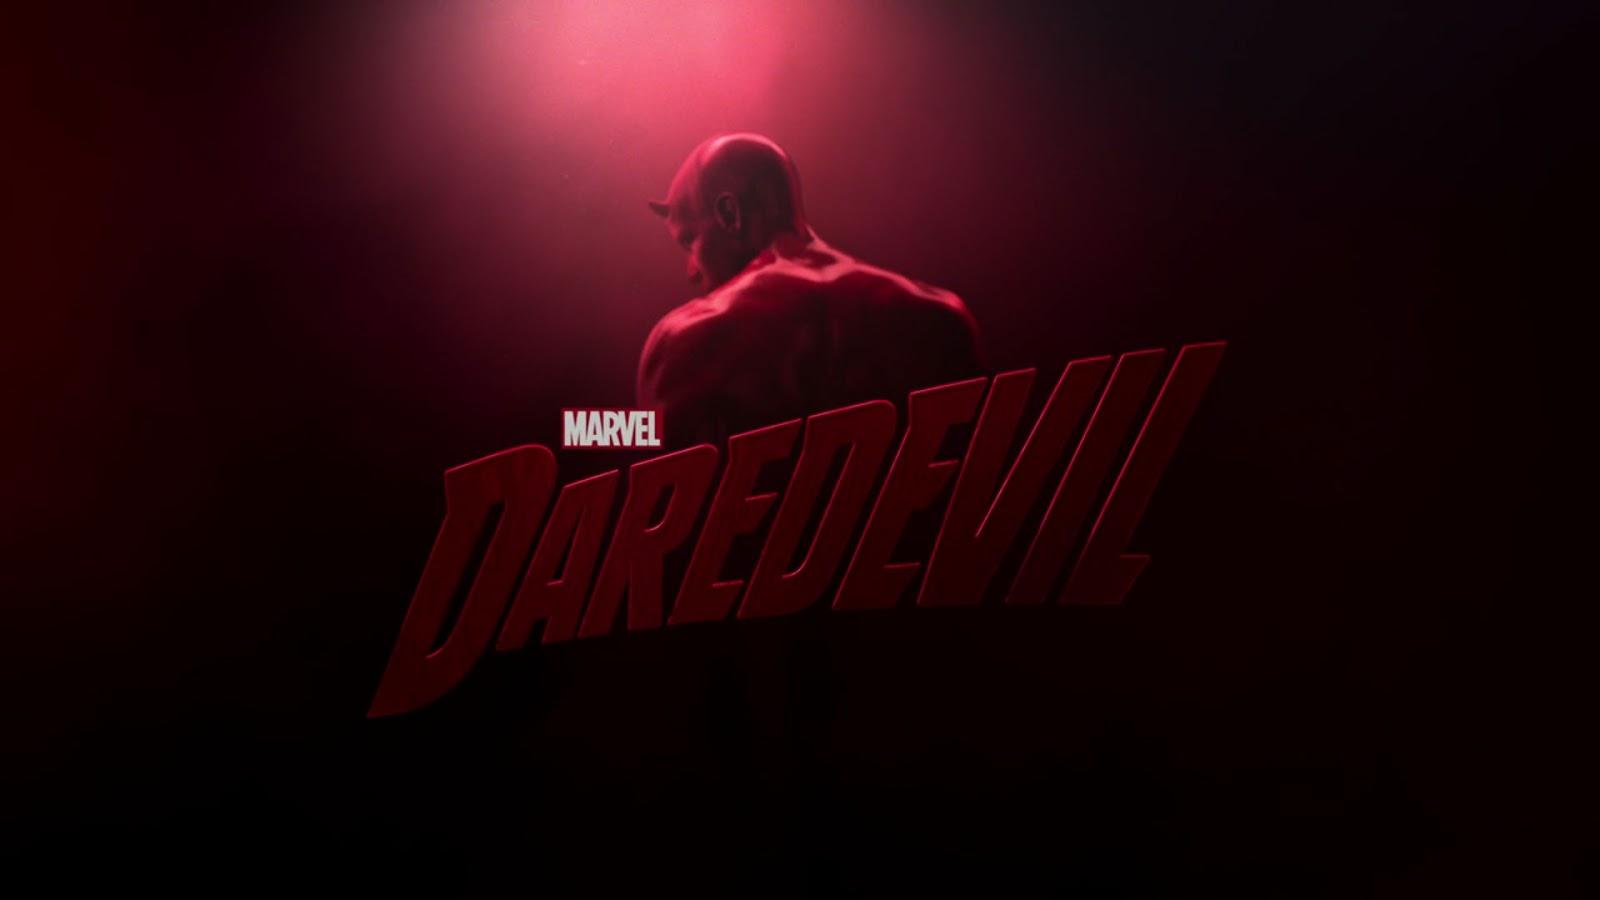 Netflix desktop Marvel's Daredevil wallpaper